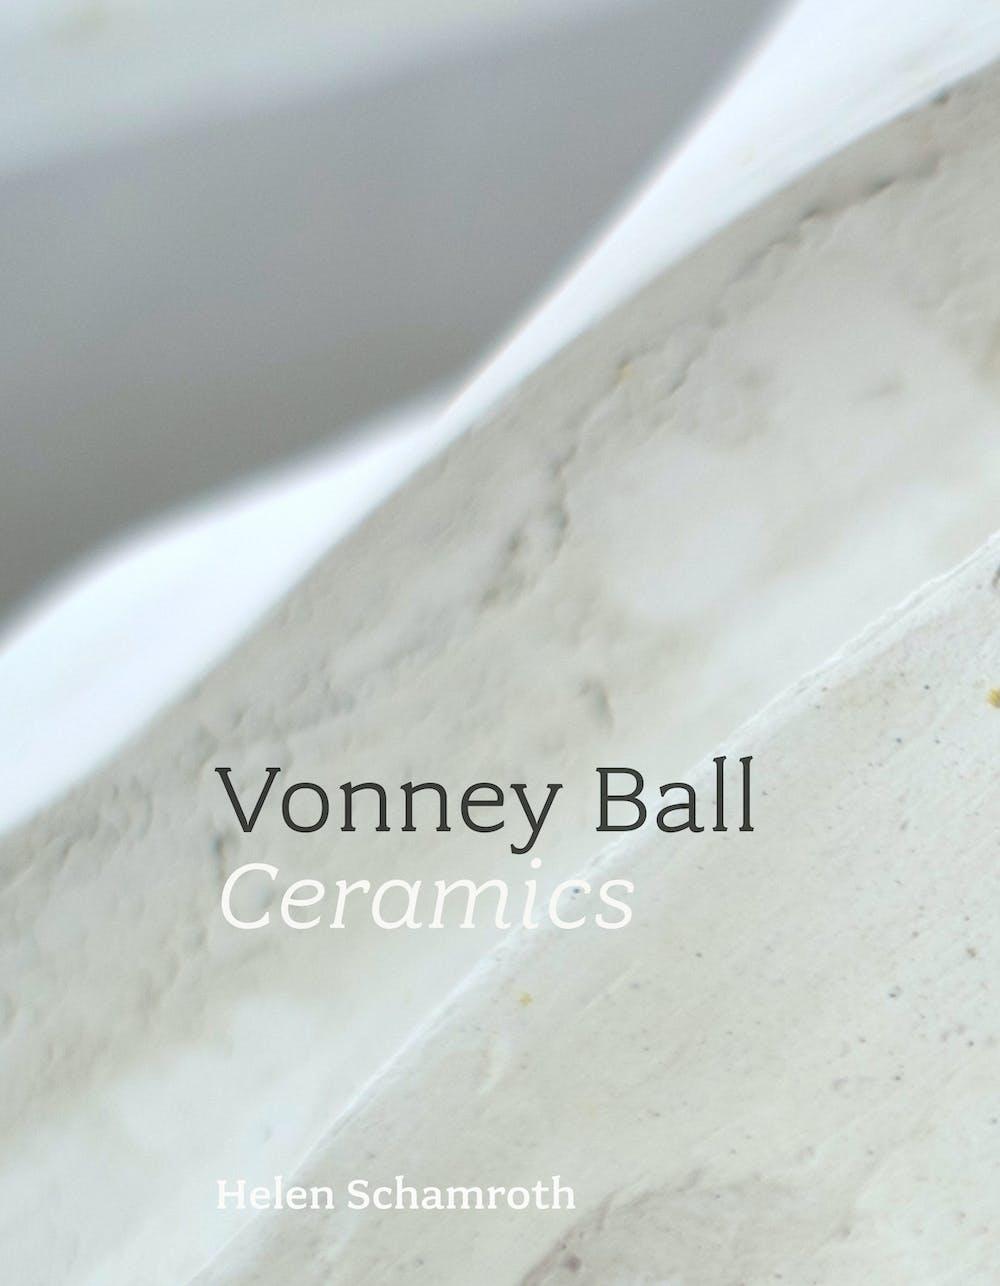 Vonney Ball Image 1